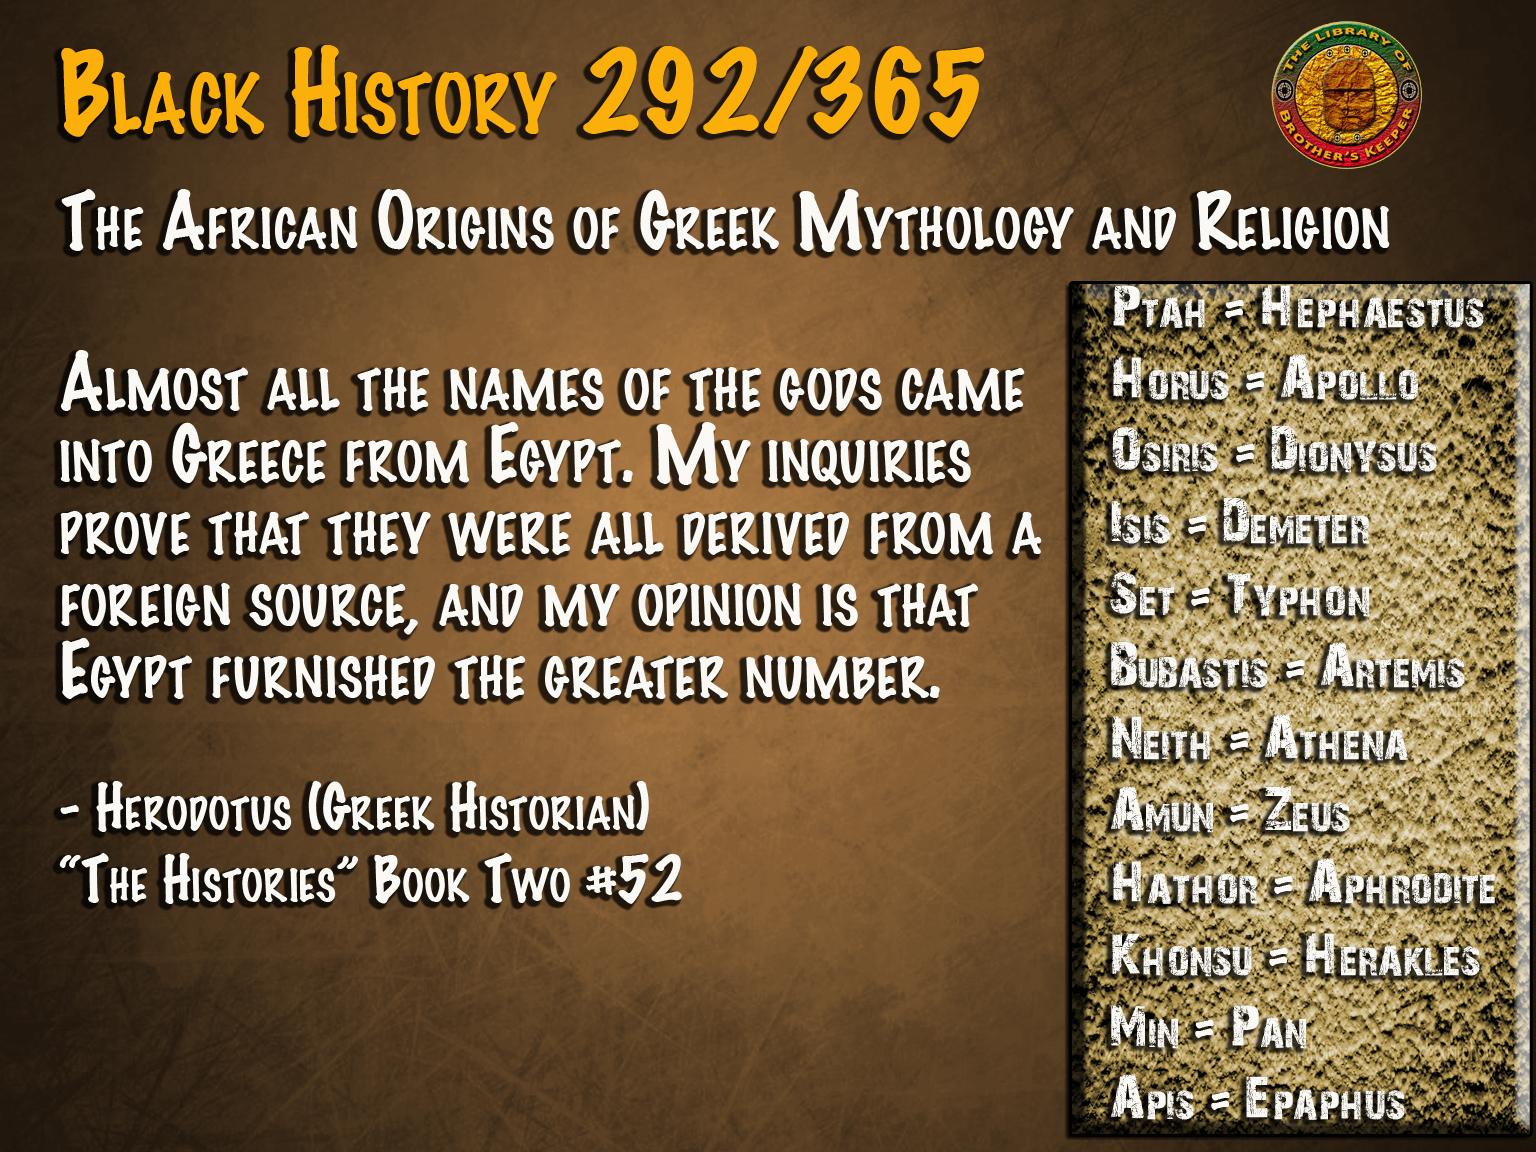 African Origins of Greek Religion